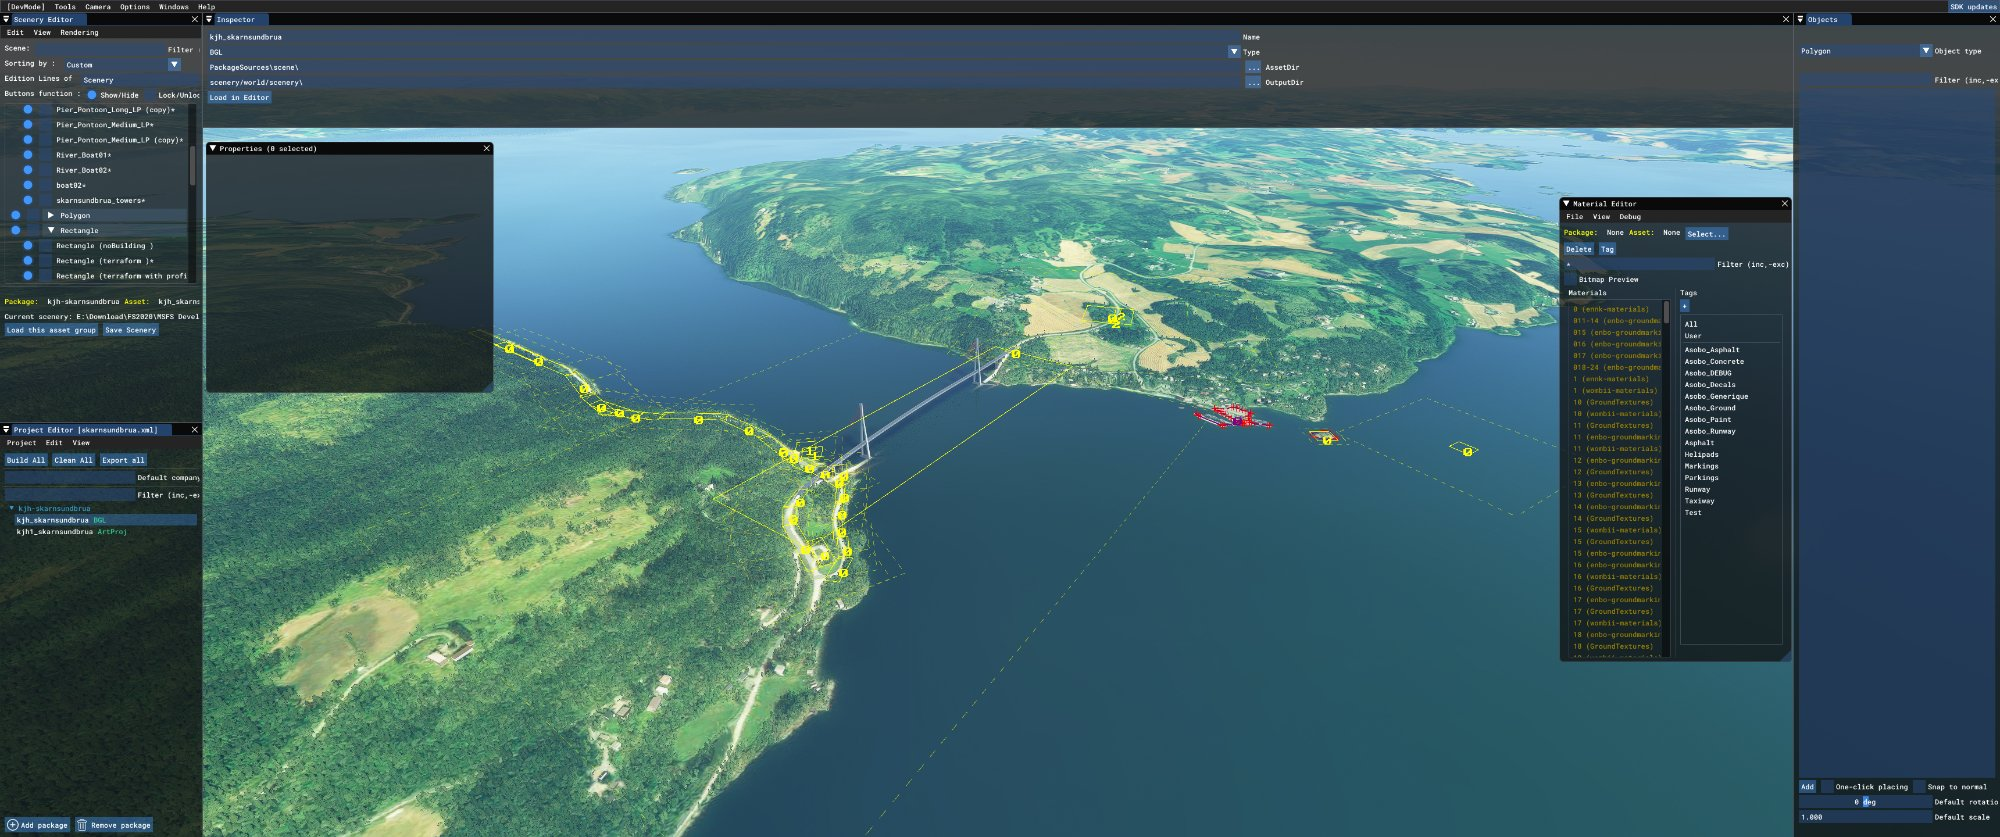 Microsoft Flight Simulator Screenshot 2021.05.18 - 21.34.38.61.jpg